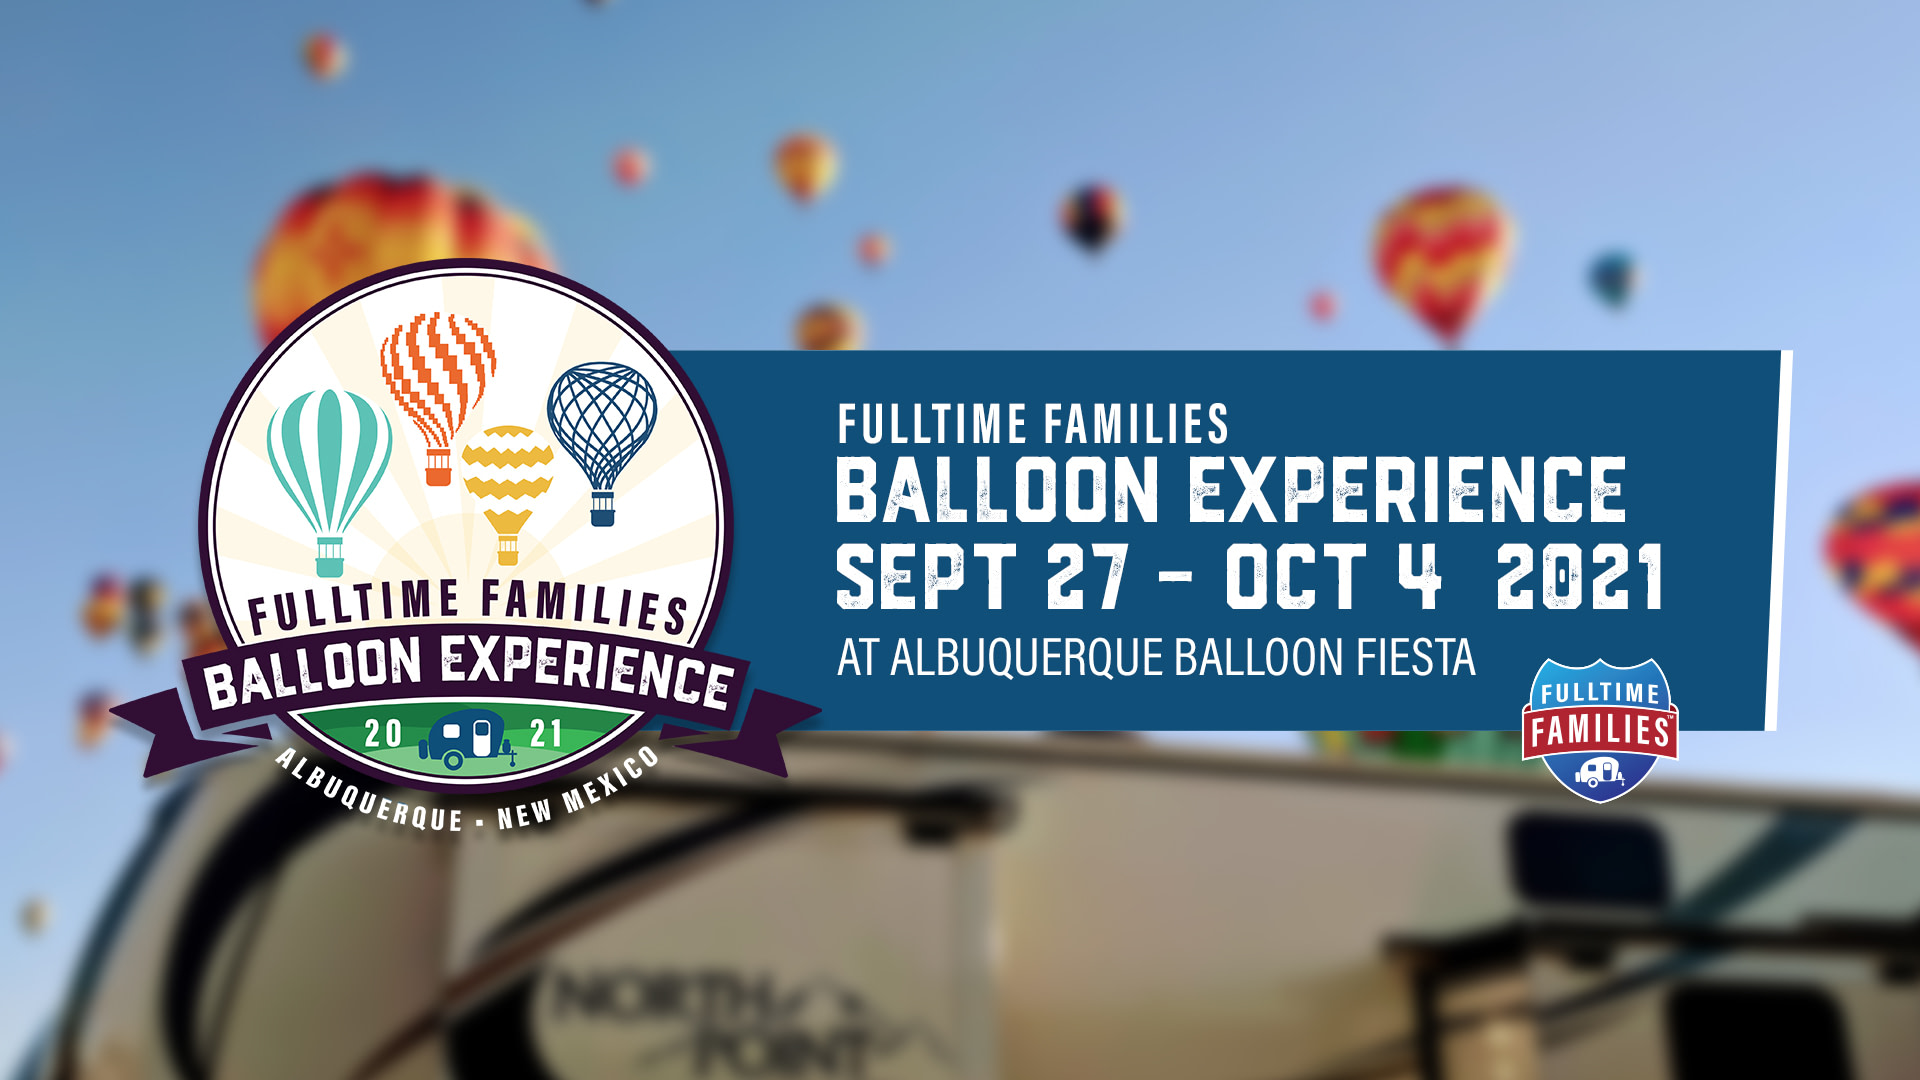 ABQ Balloon Fiesta 2021